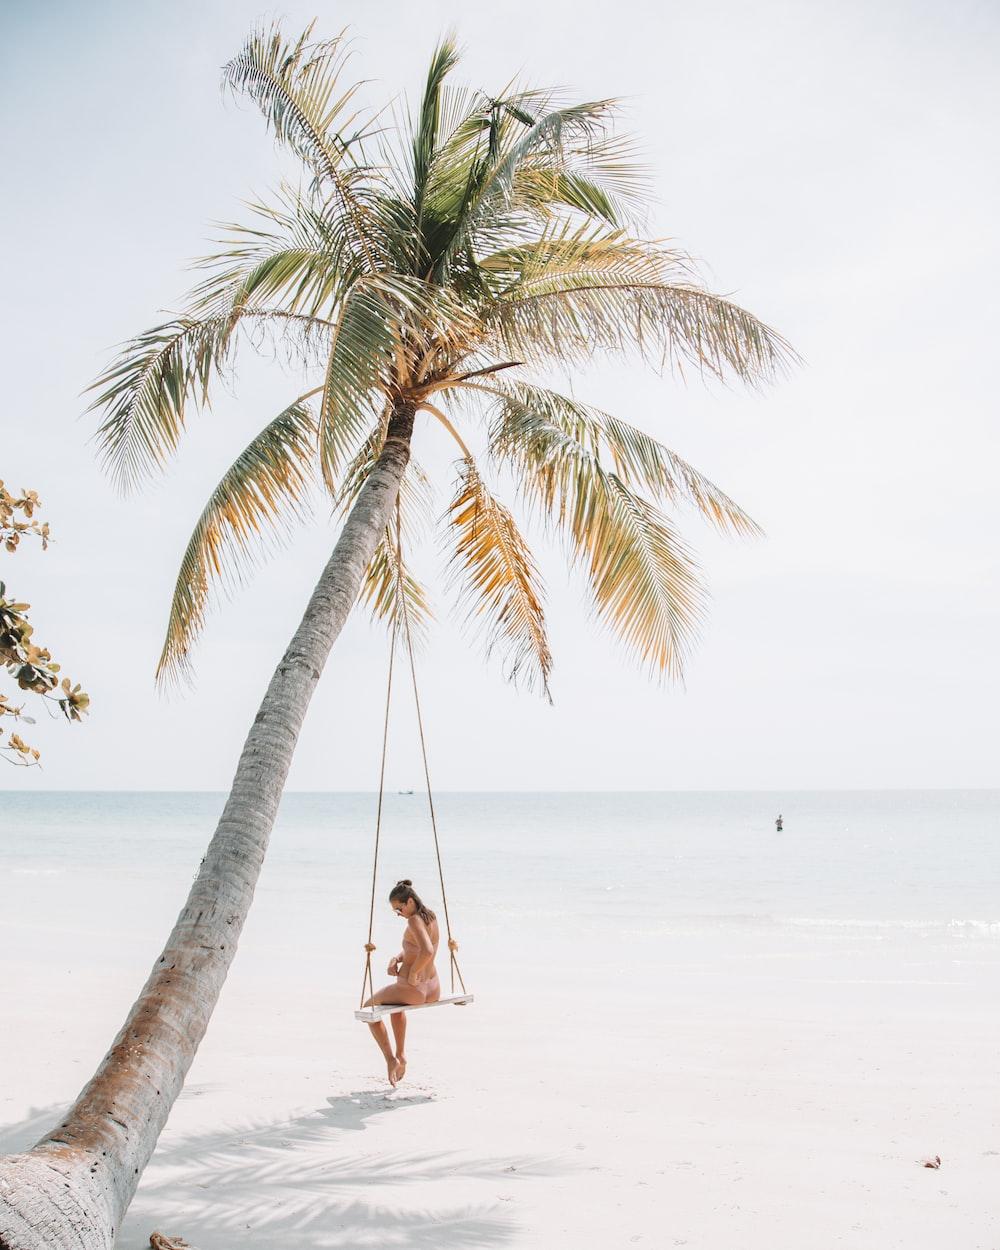 woman wearing bikini sitting on swing near coconut tree